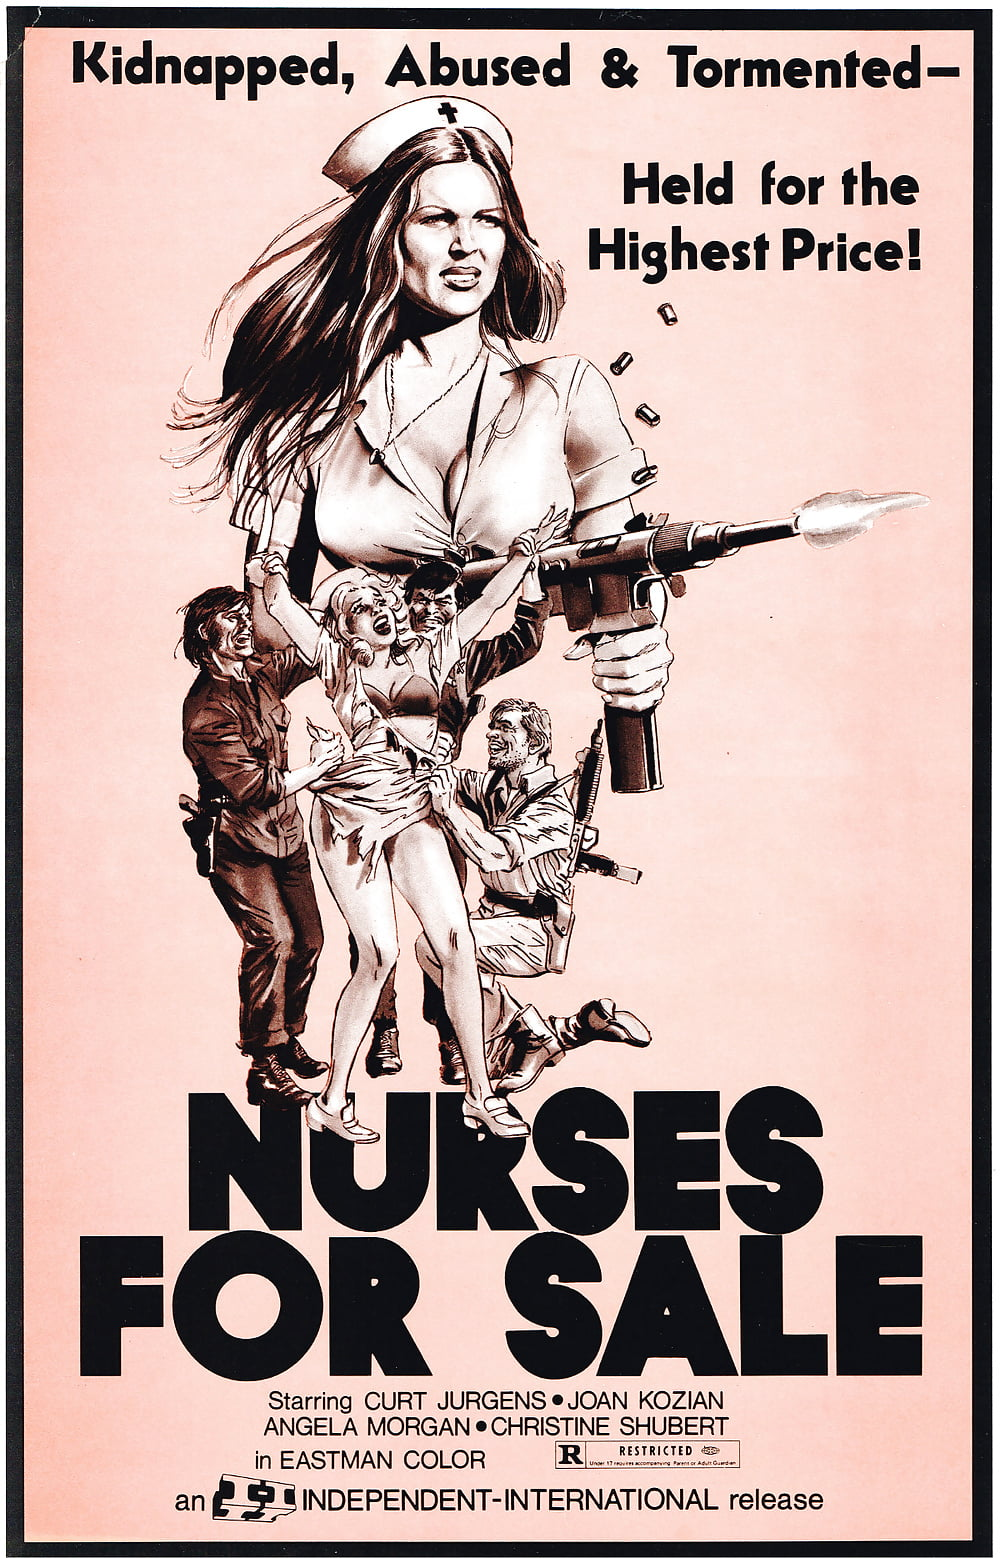 Naughty nurses naked